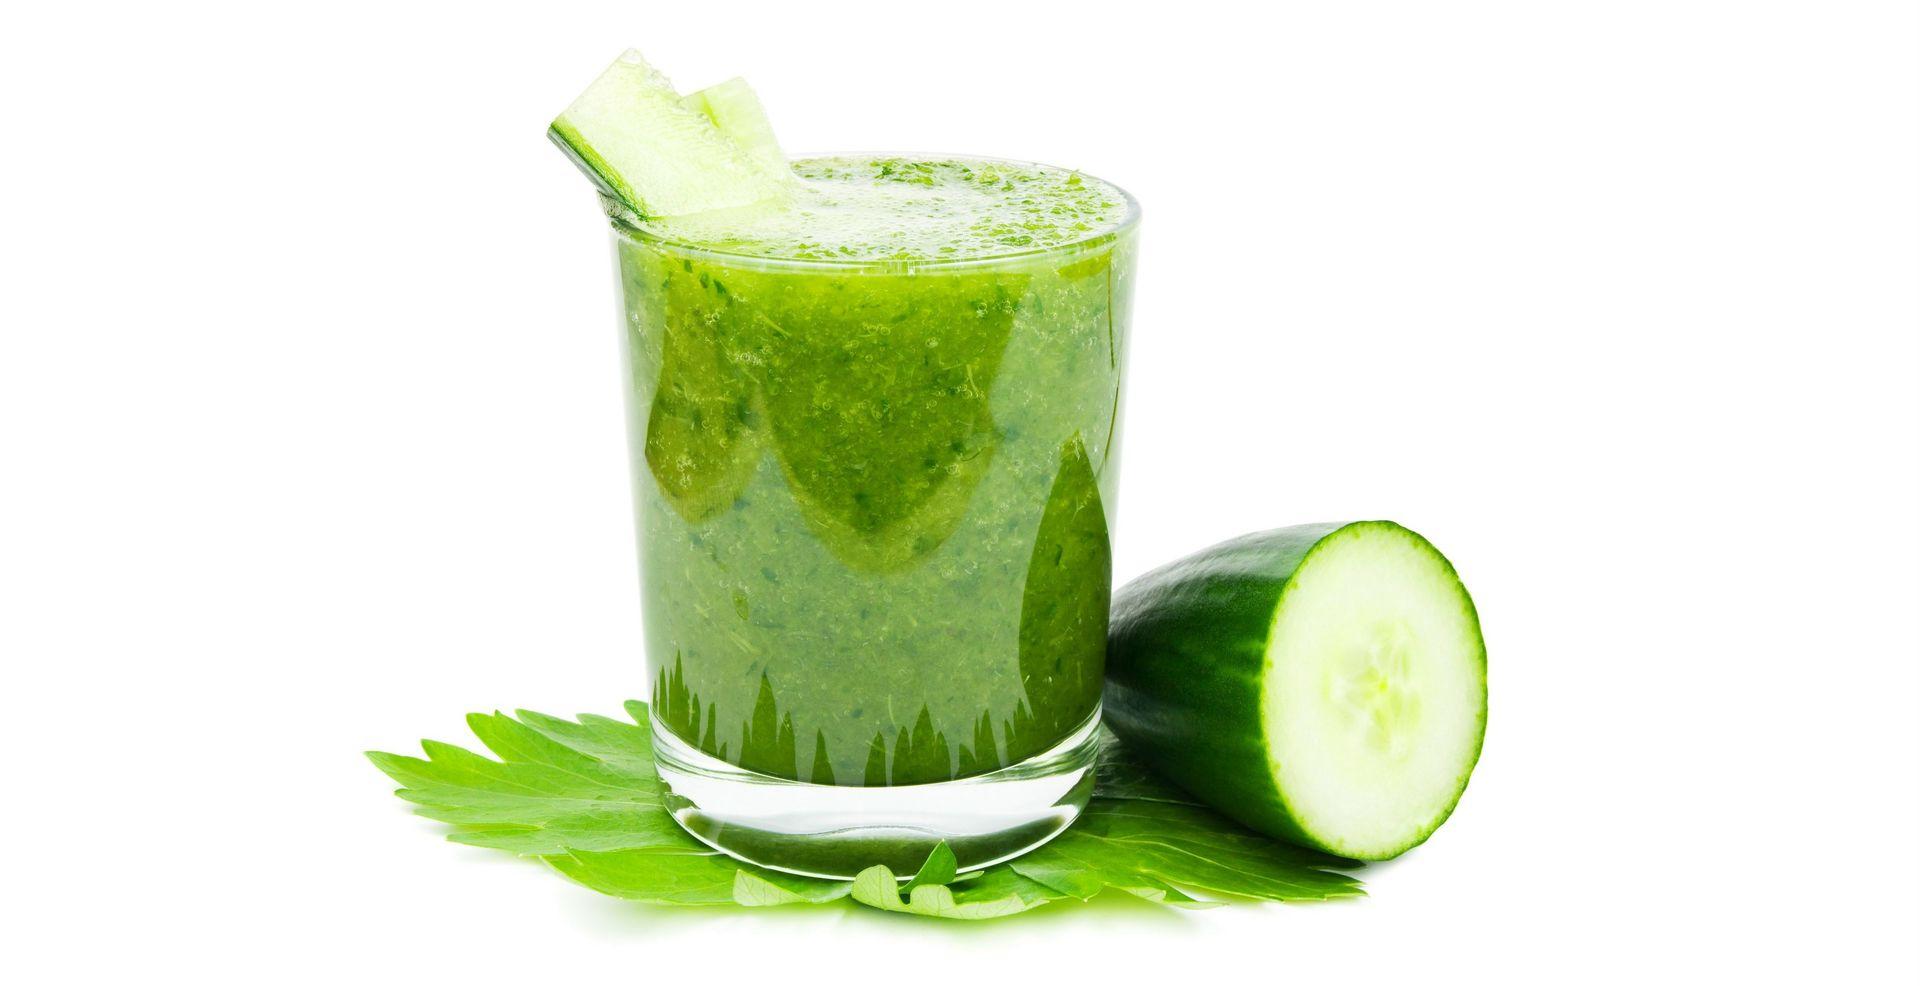 jugos-verdes-para-adelgazar1-fitness